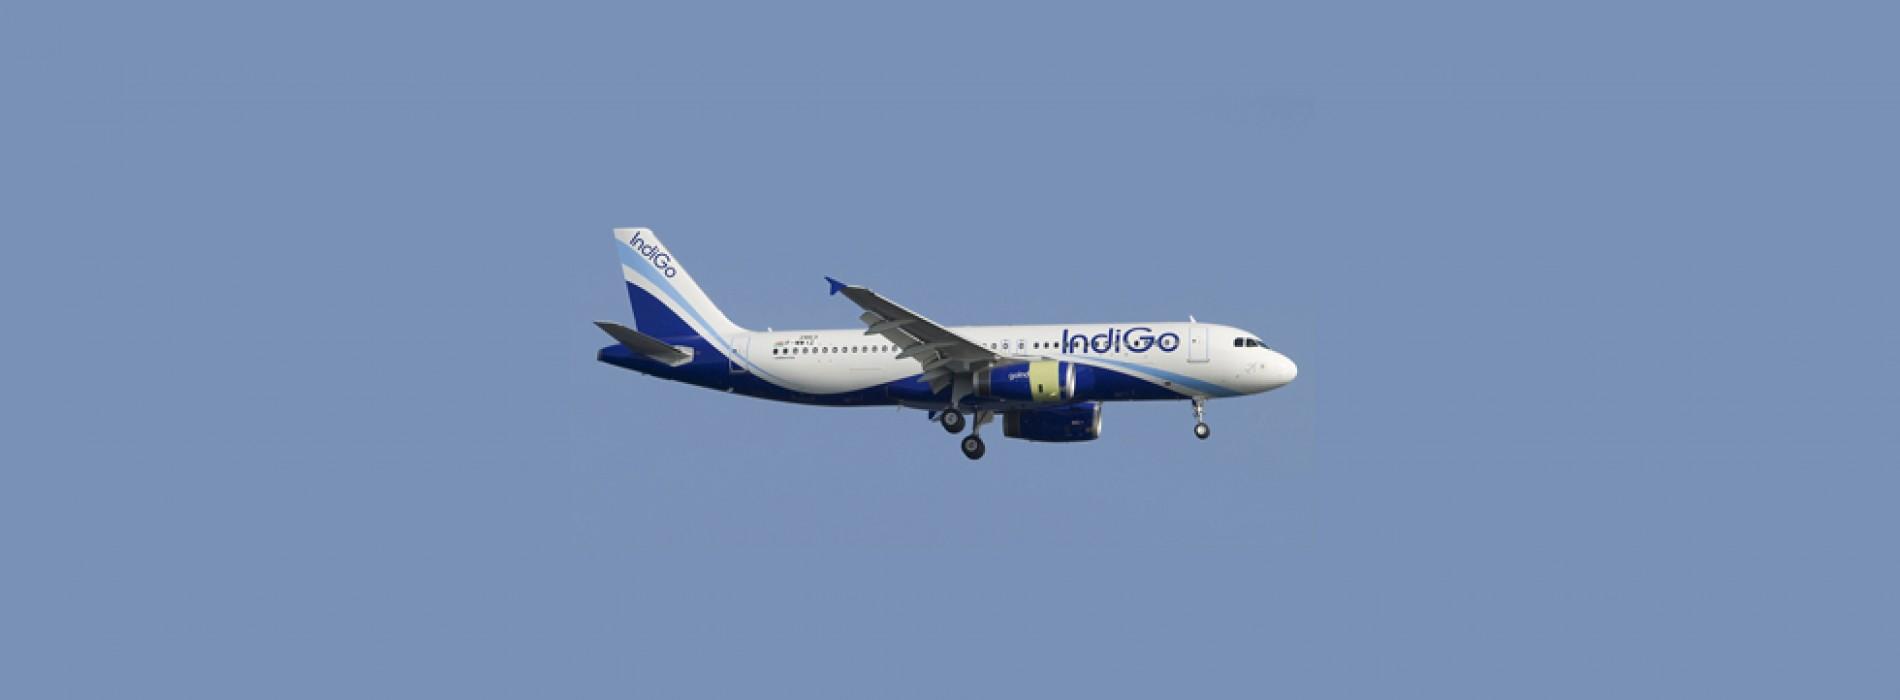 AAIB may investigate IndiGo Mumbai flight engine failure